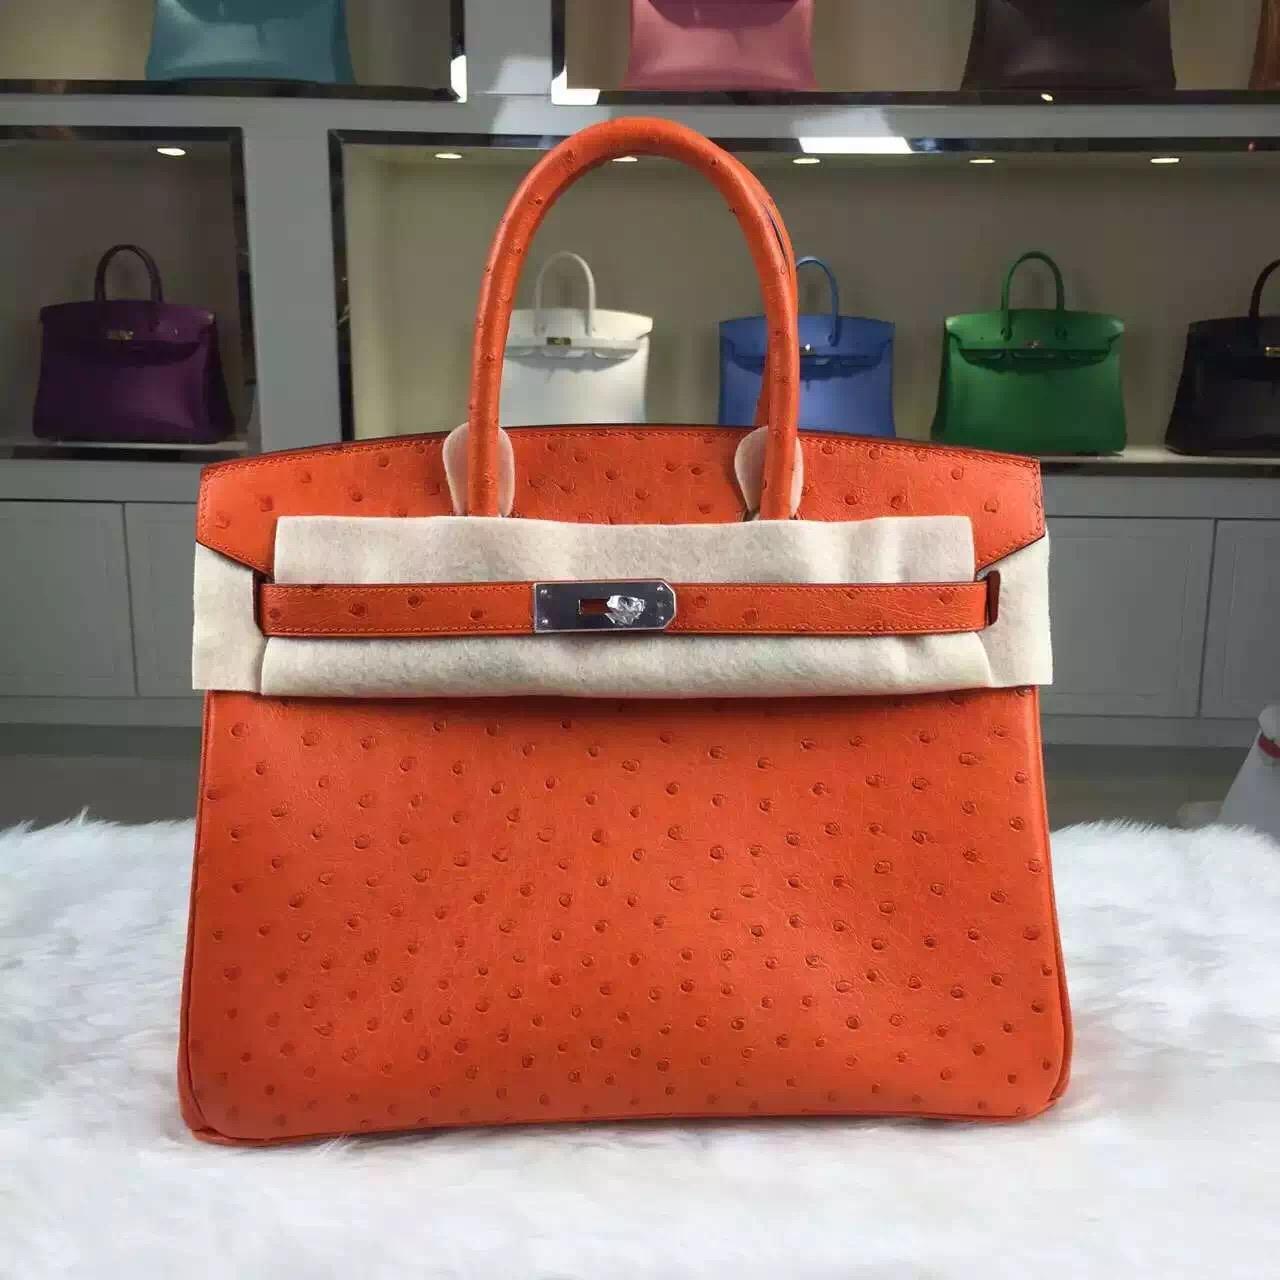 Discount Hermes Original Ostrich Leather Birkin 30CM Orange Color Silver Hardware